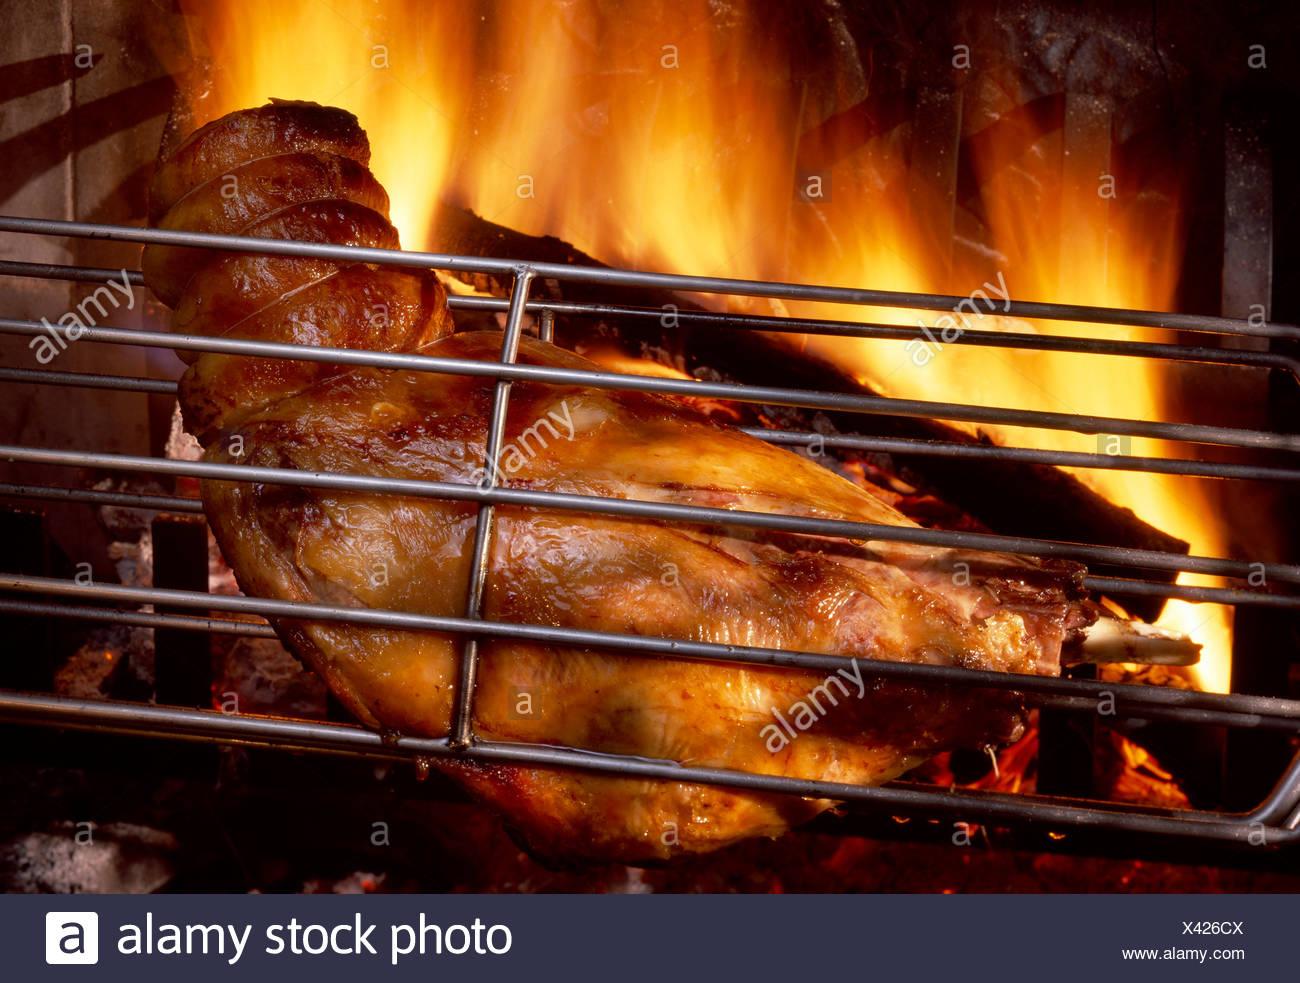 Ducasse wood fire leg of lamb - Stock Image